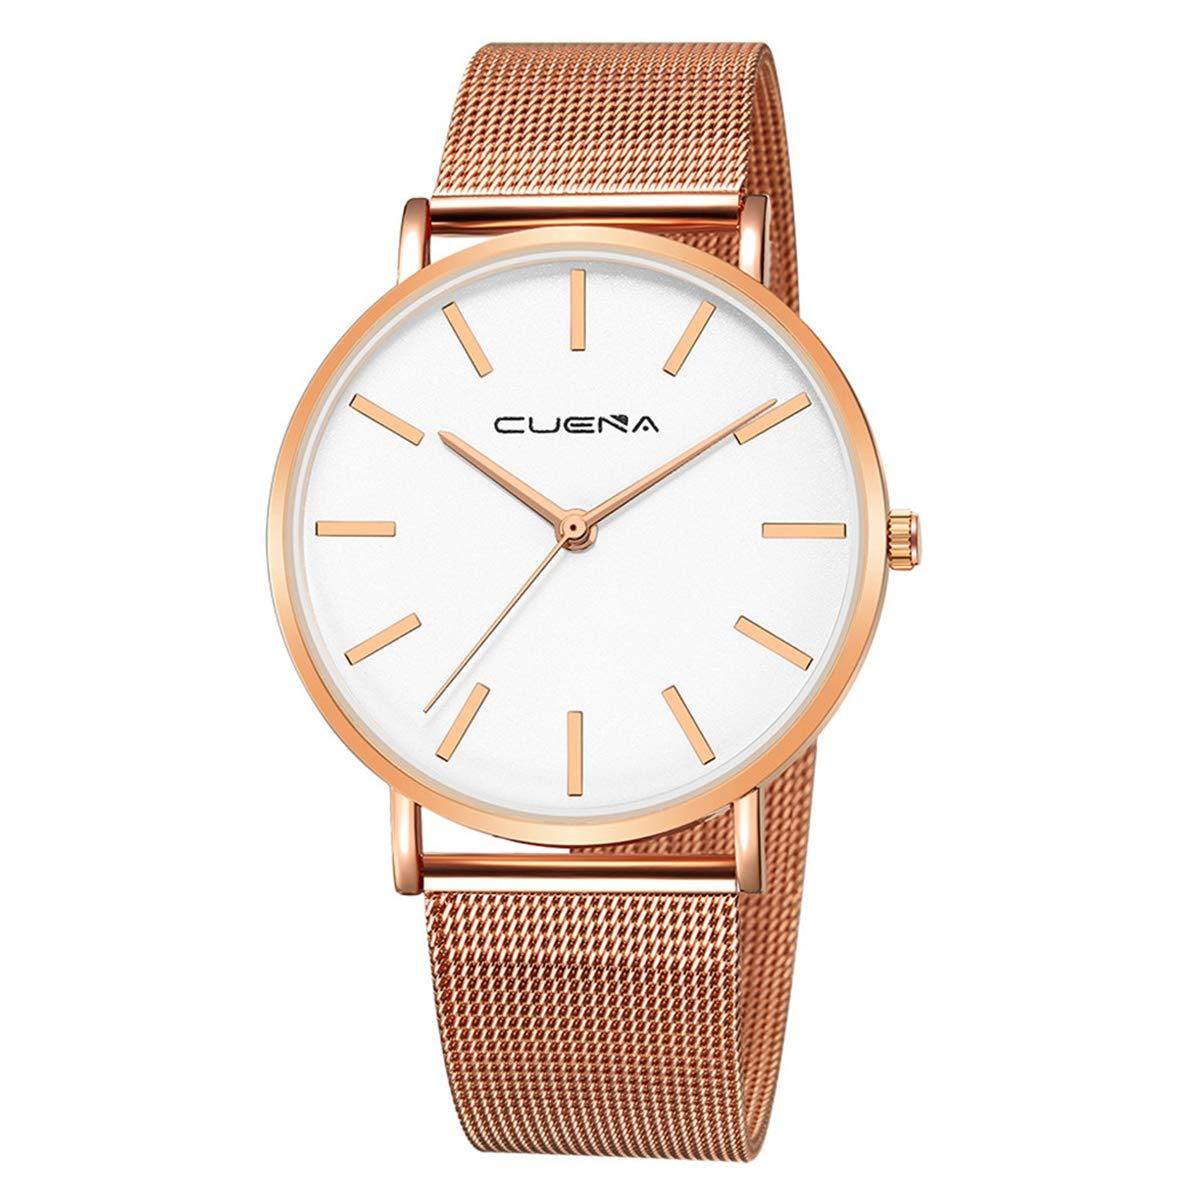 ZODRQ Men's Watch,Fashion Watches Stainless Steel Mesh Wrist Watch Casual Wristwatch Quartz Watch for Men Gift (D) by ZODRQ